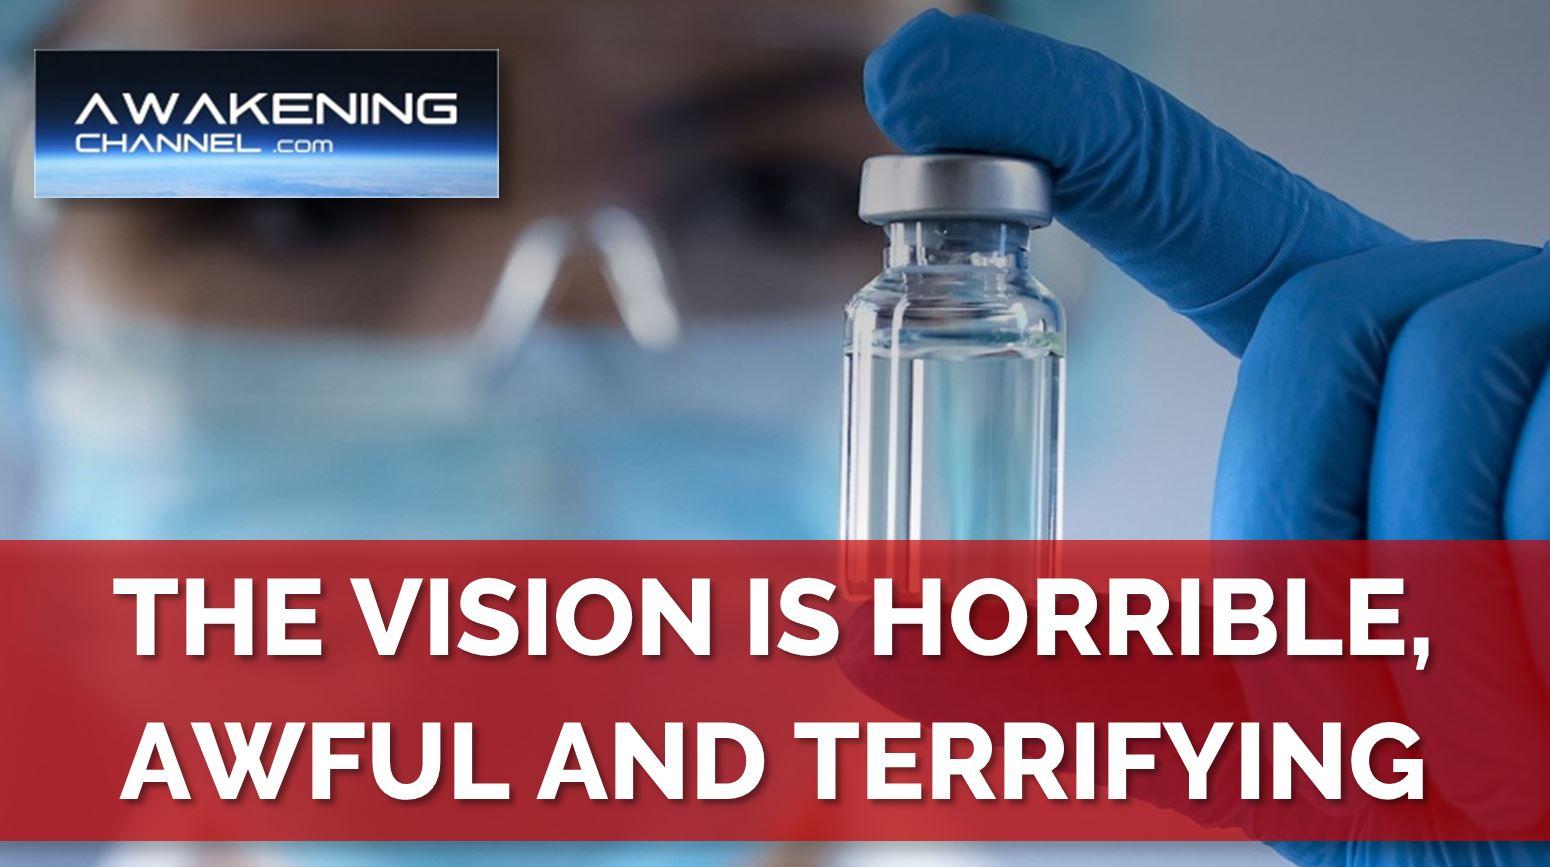 Prof. Dr. Bhakdi, Studies Show Something Very Very Alarming Regarding the CV Injections